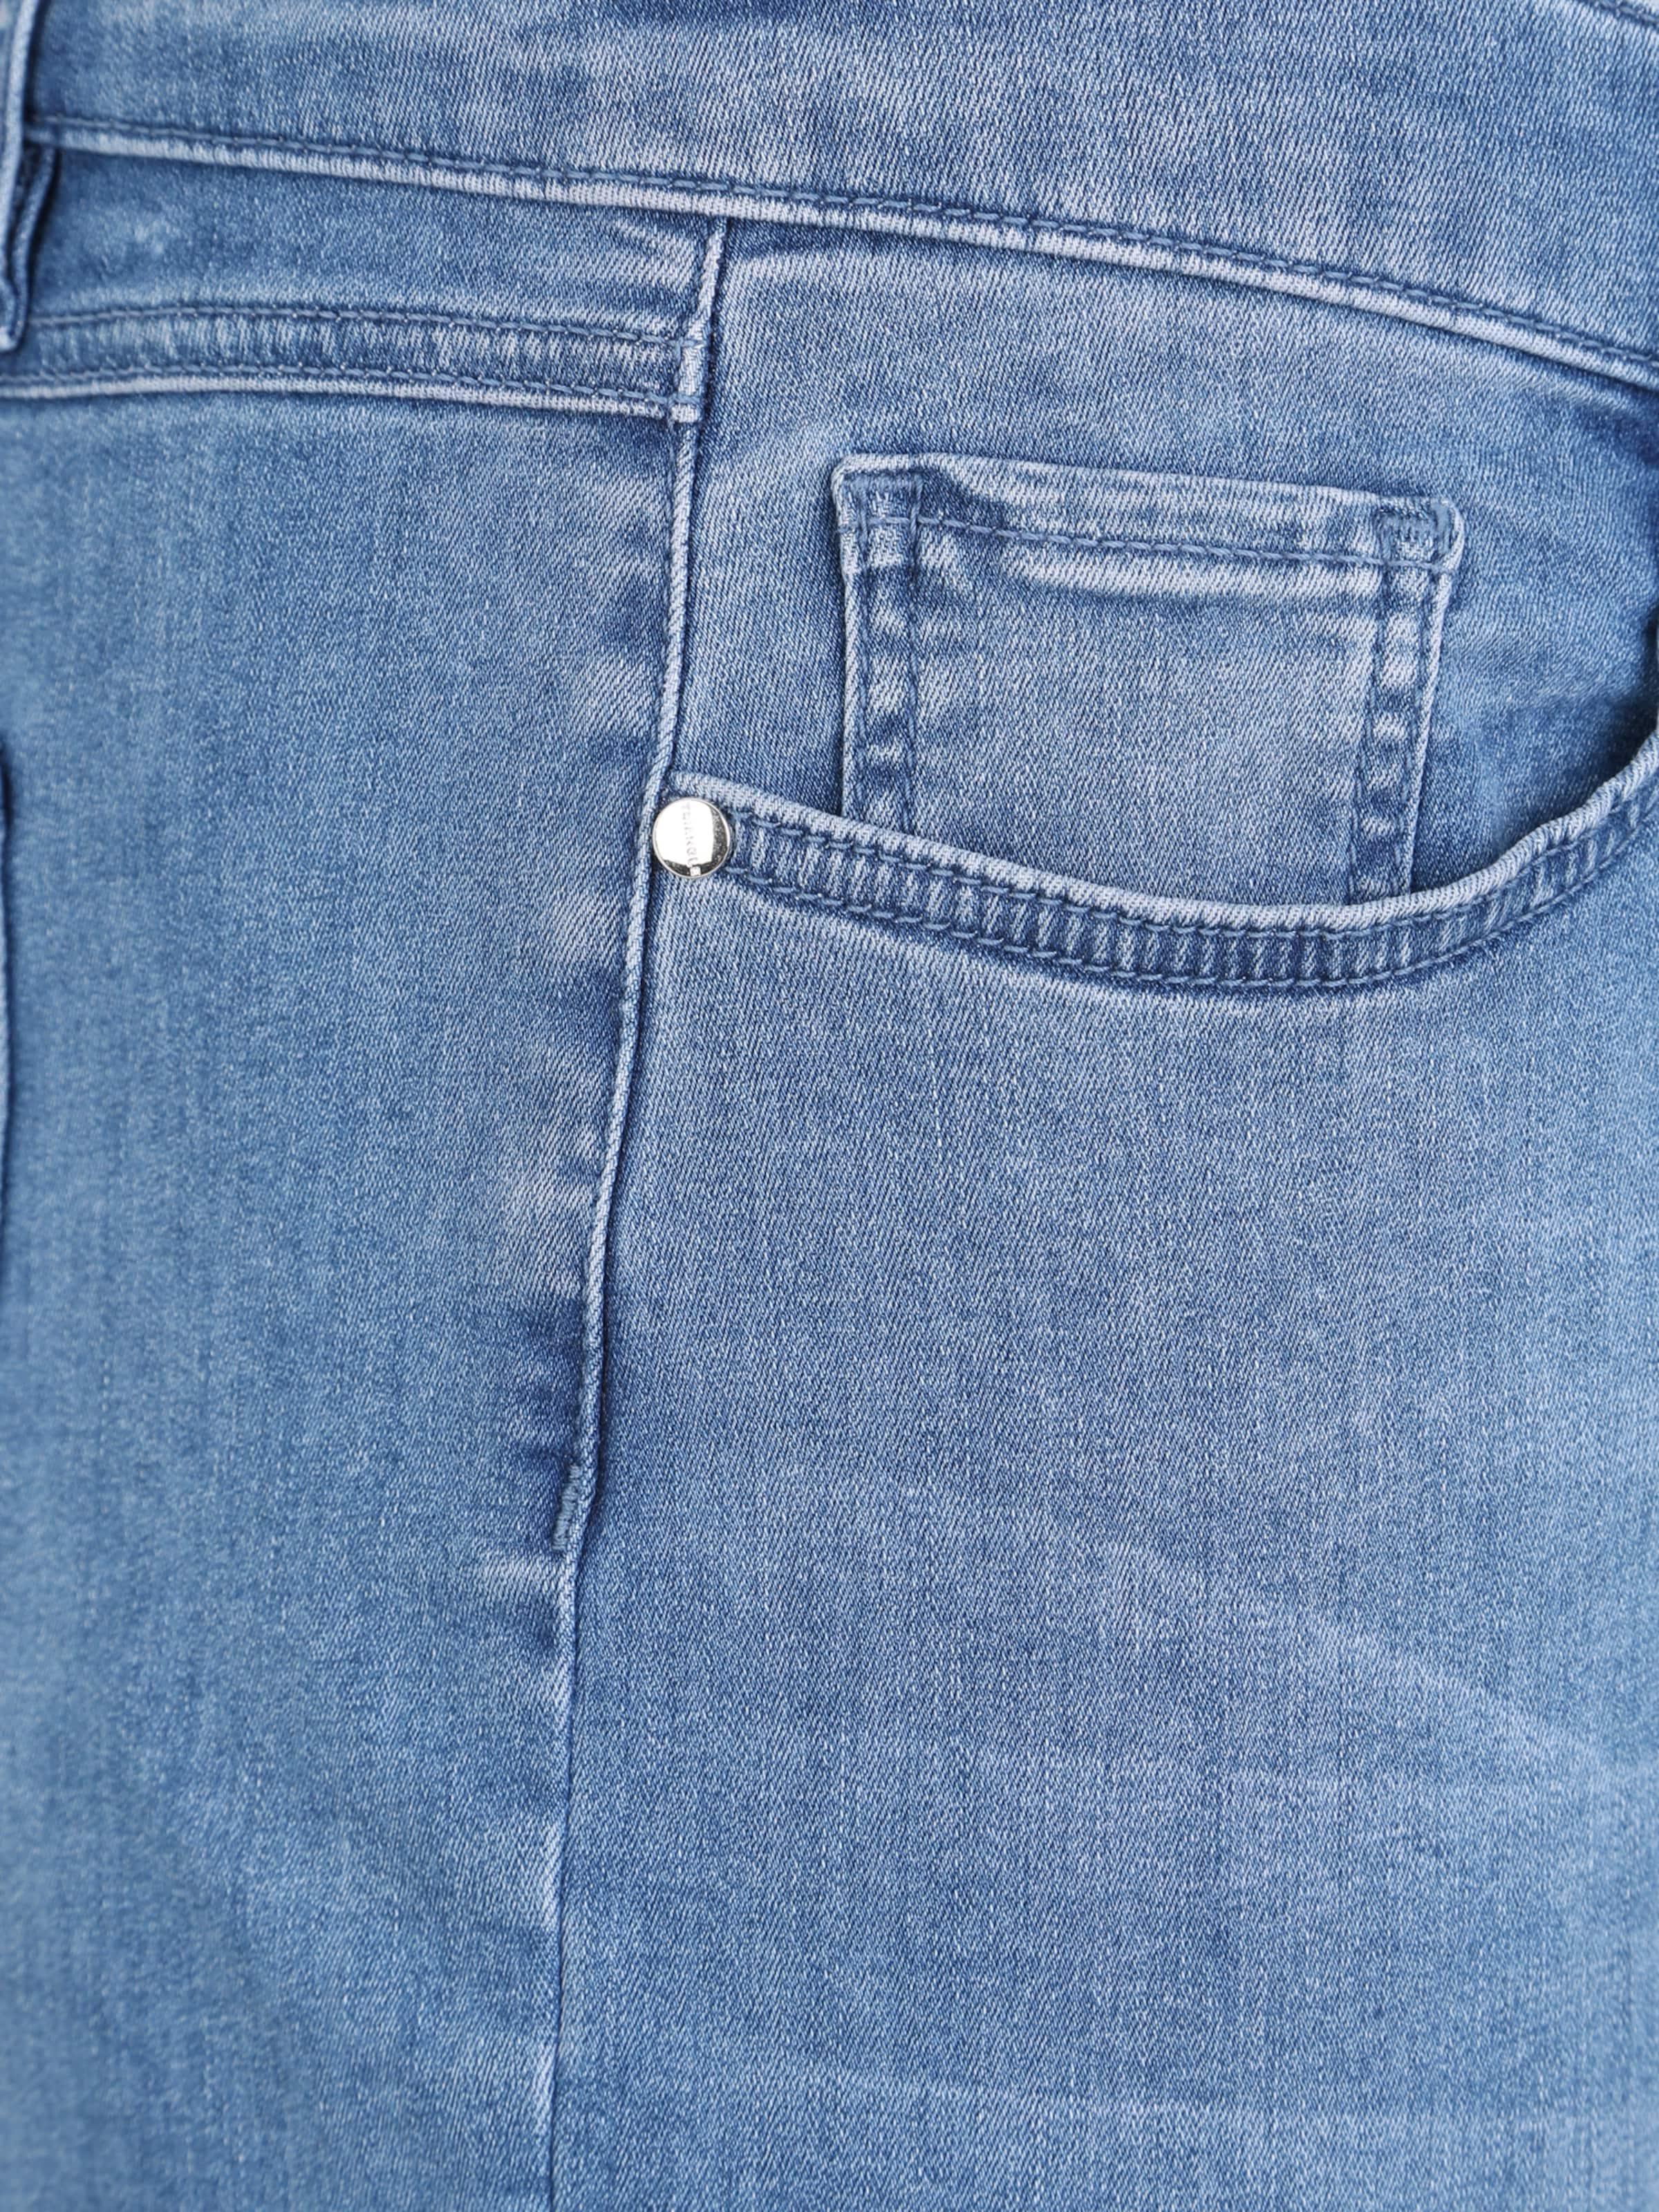 Bleu Denim En Jean Triangle 'curvy Fit' gbYf76Iyv